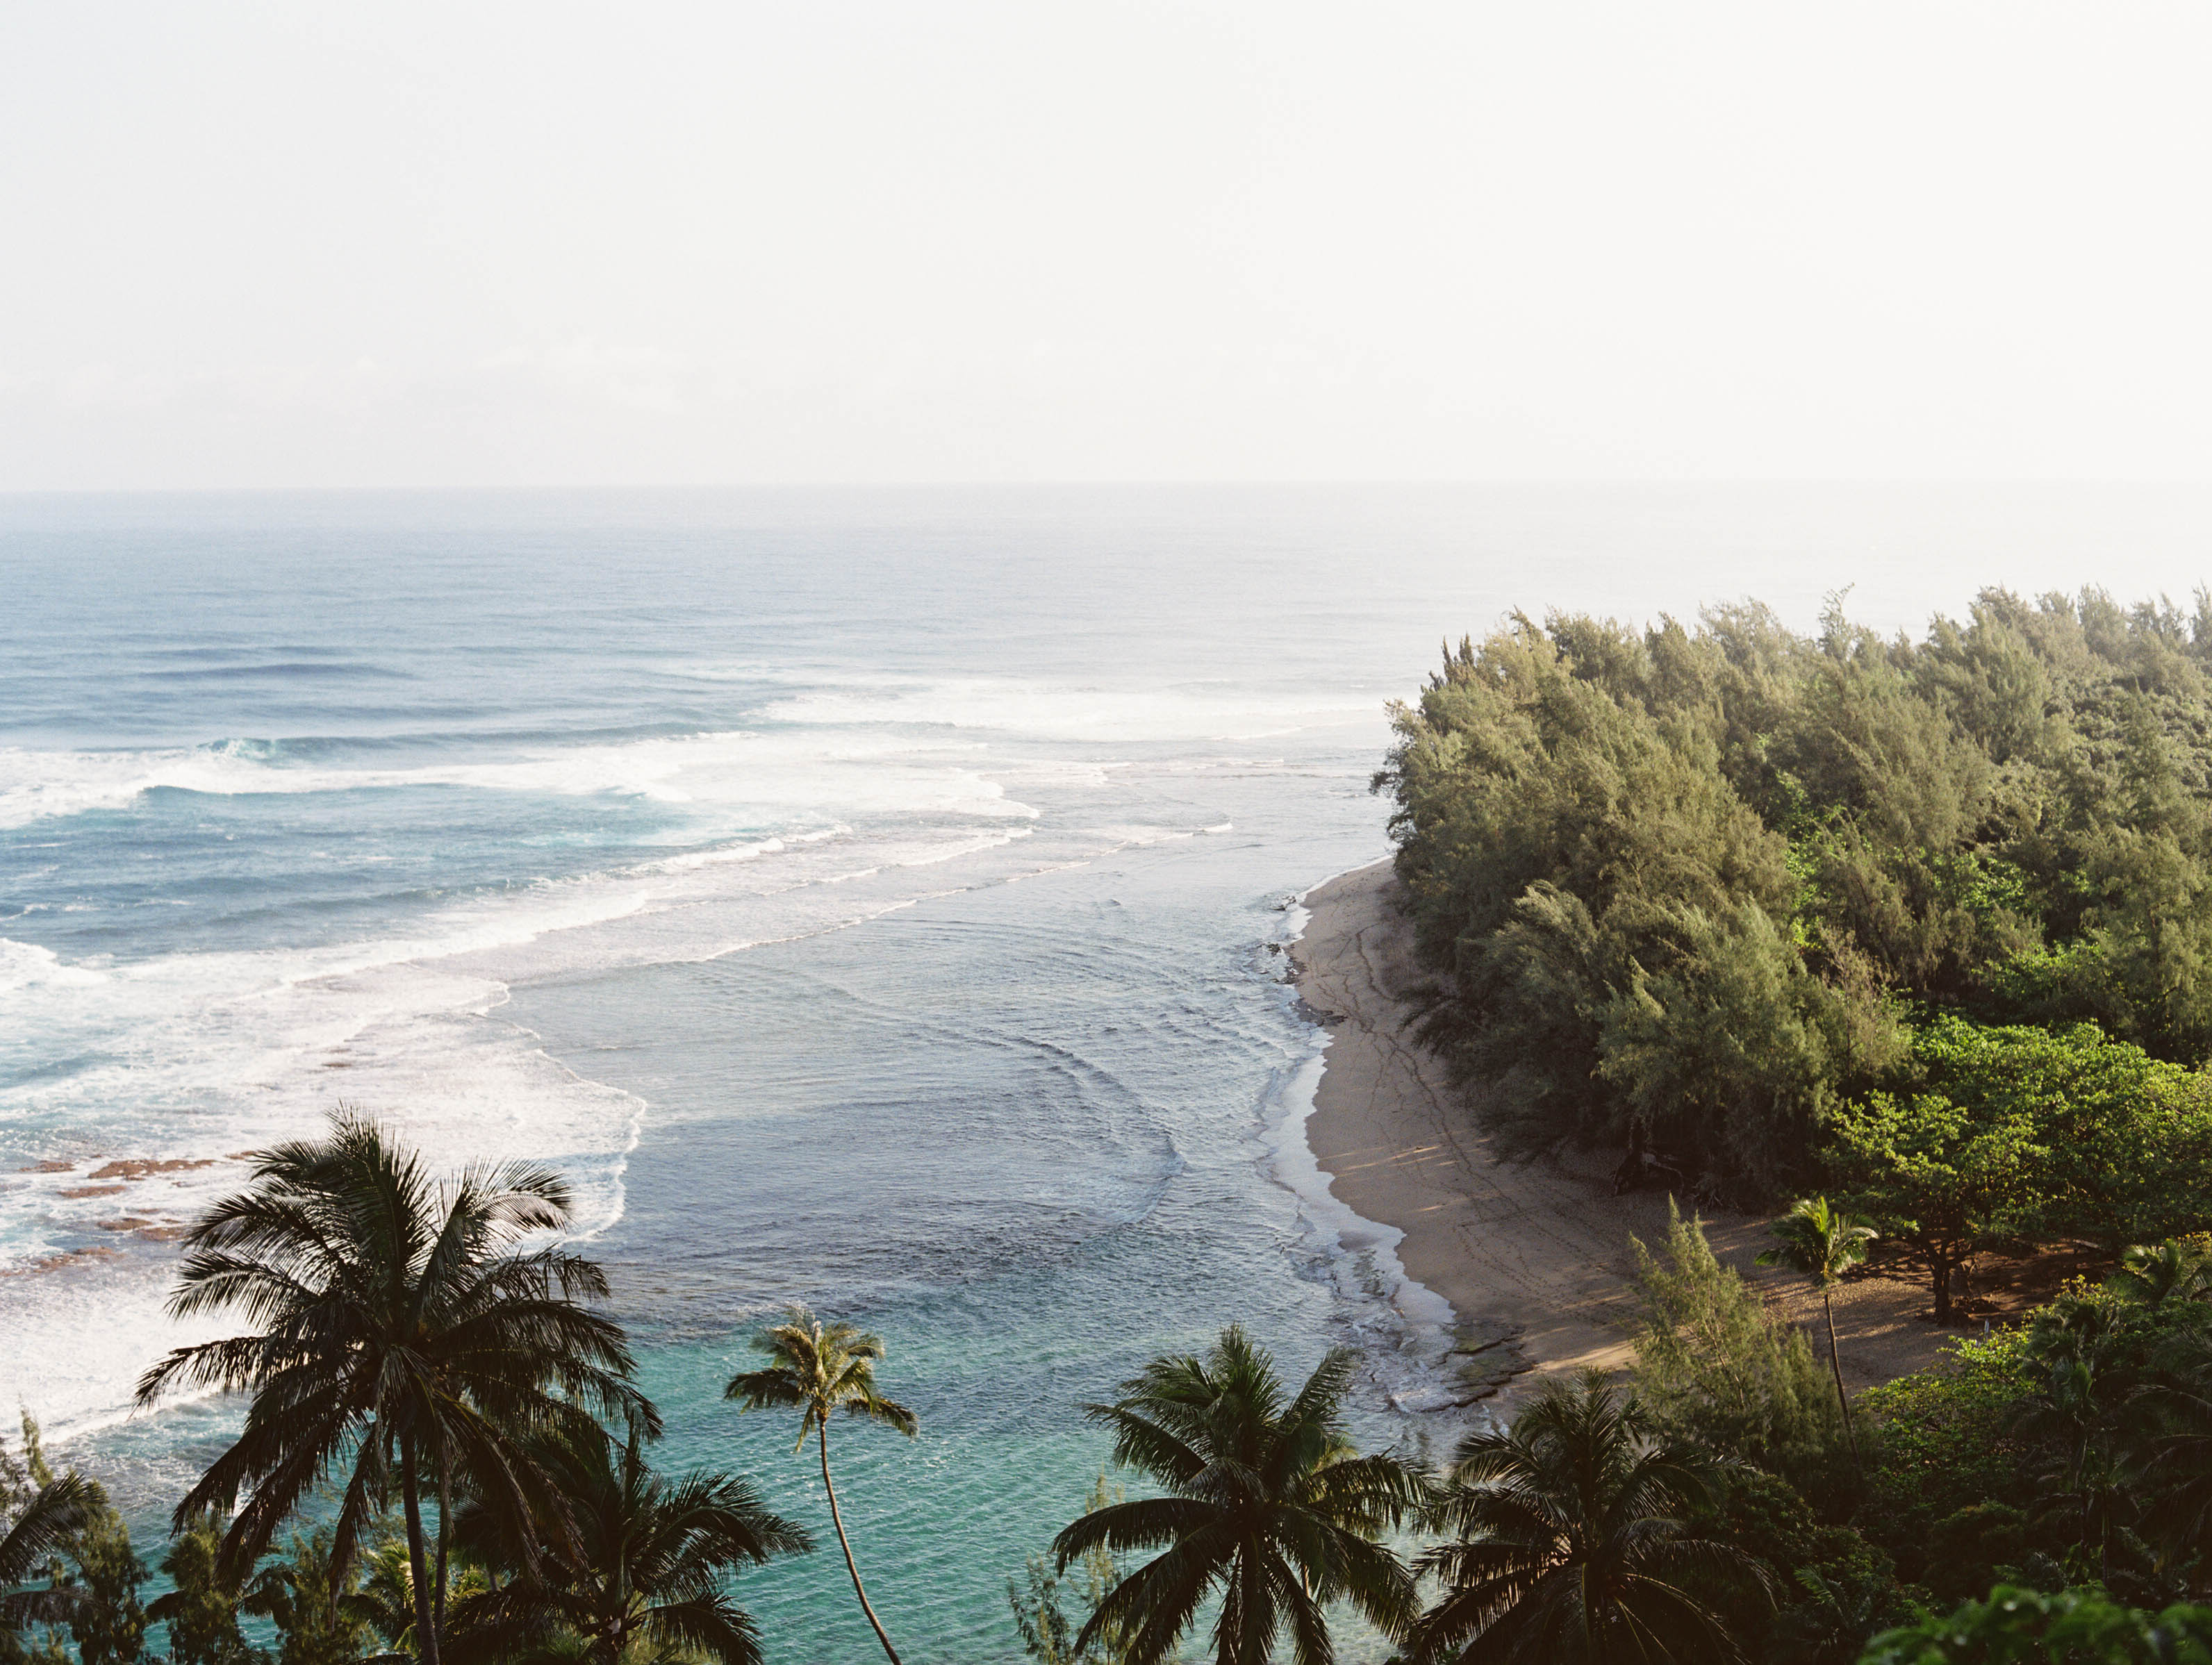 Hawaii - Katie Shuler